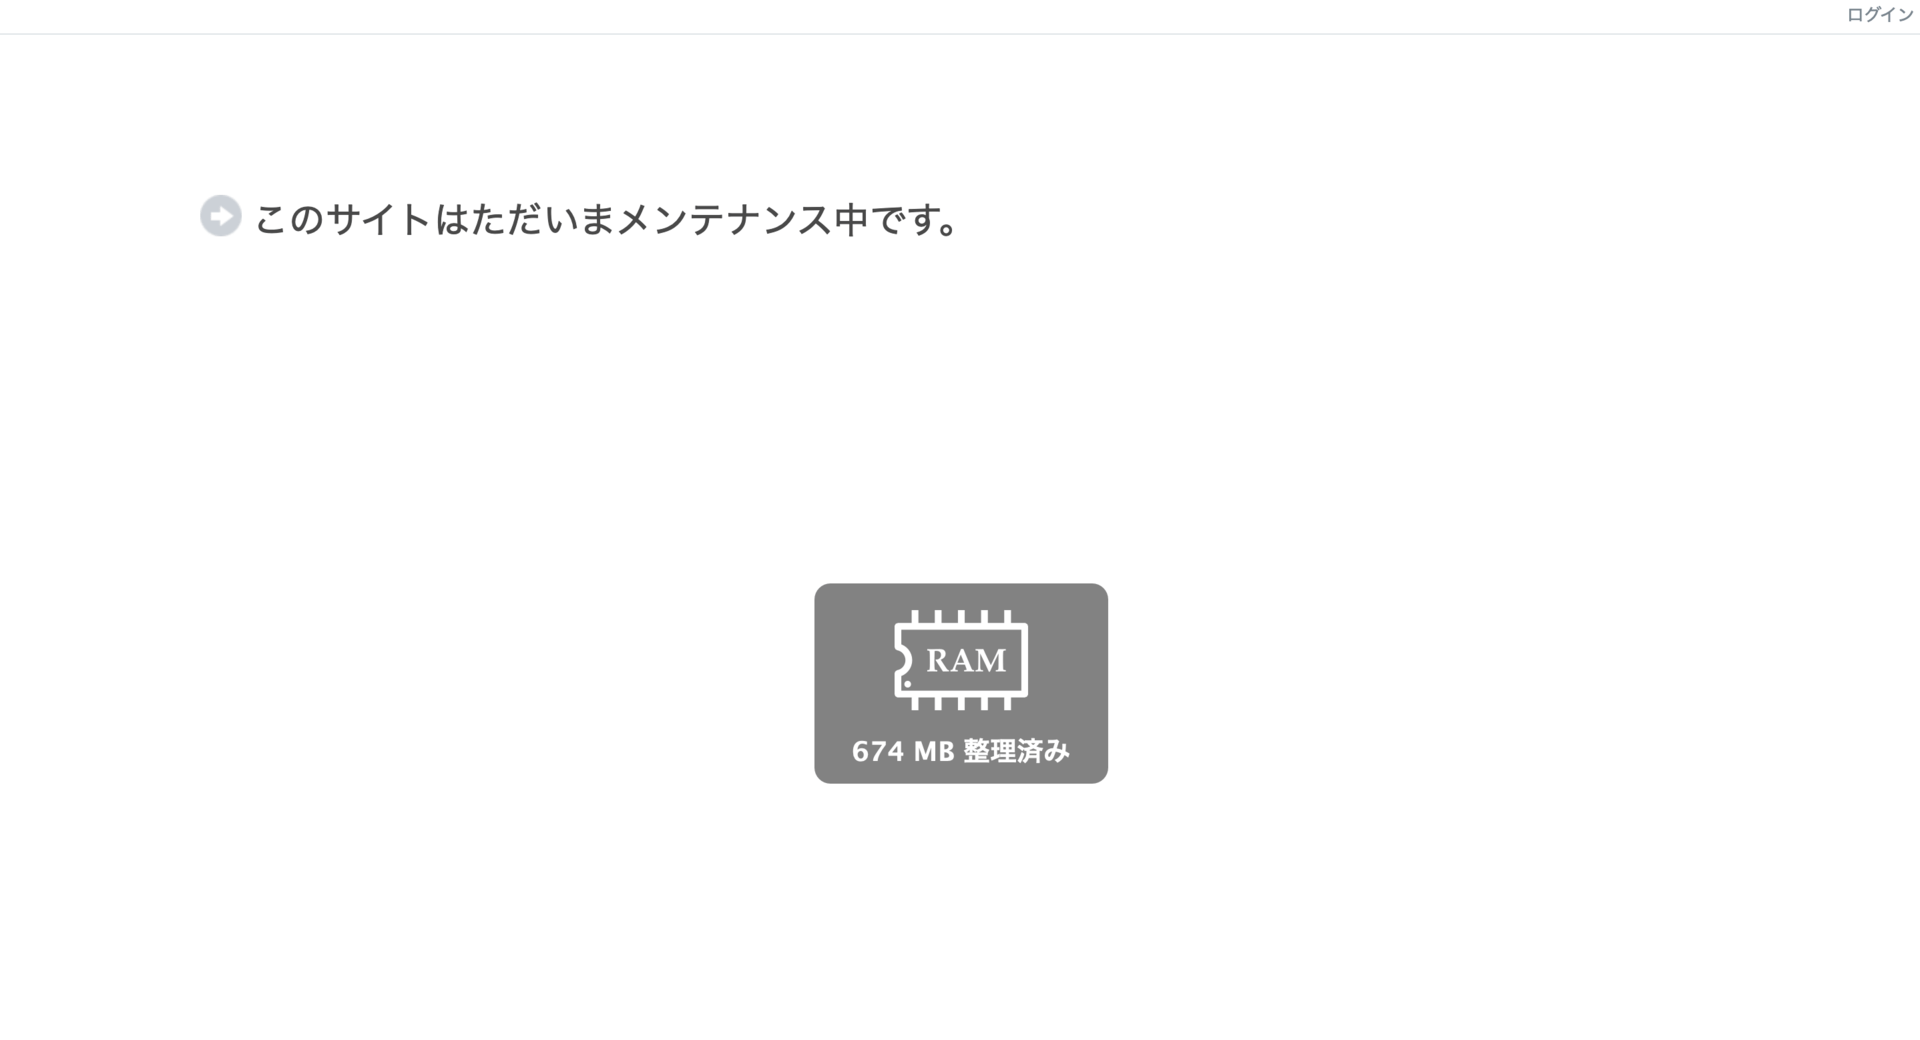 http://www2.kobe-c.ed.jp/hsm-es/ より